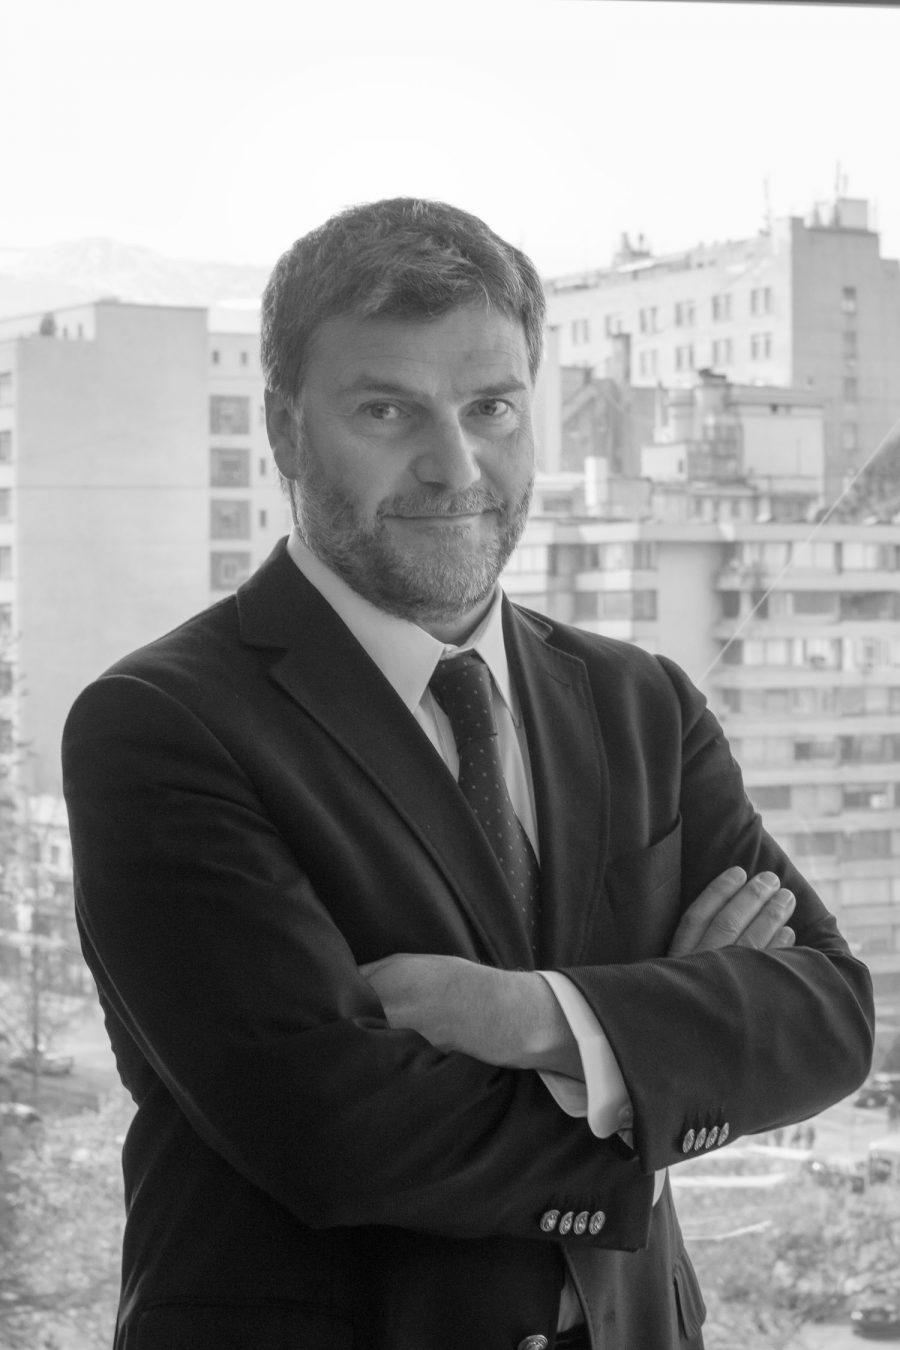 El abogado Andrés Mahnke Malschafsky estará presente este 16 de abril